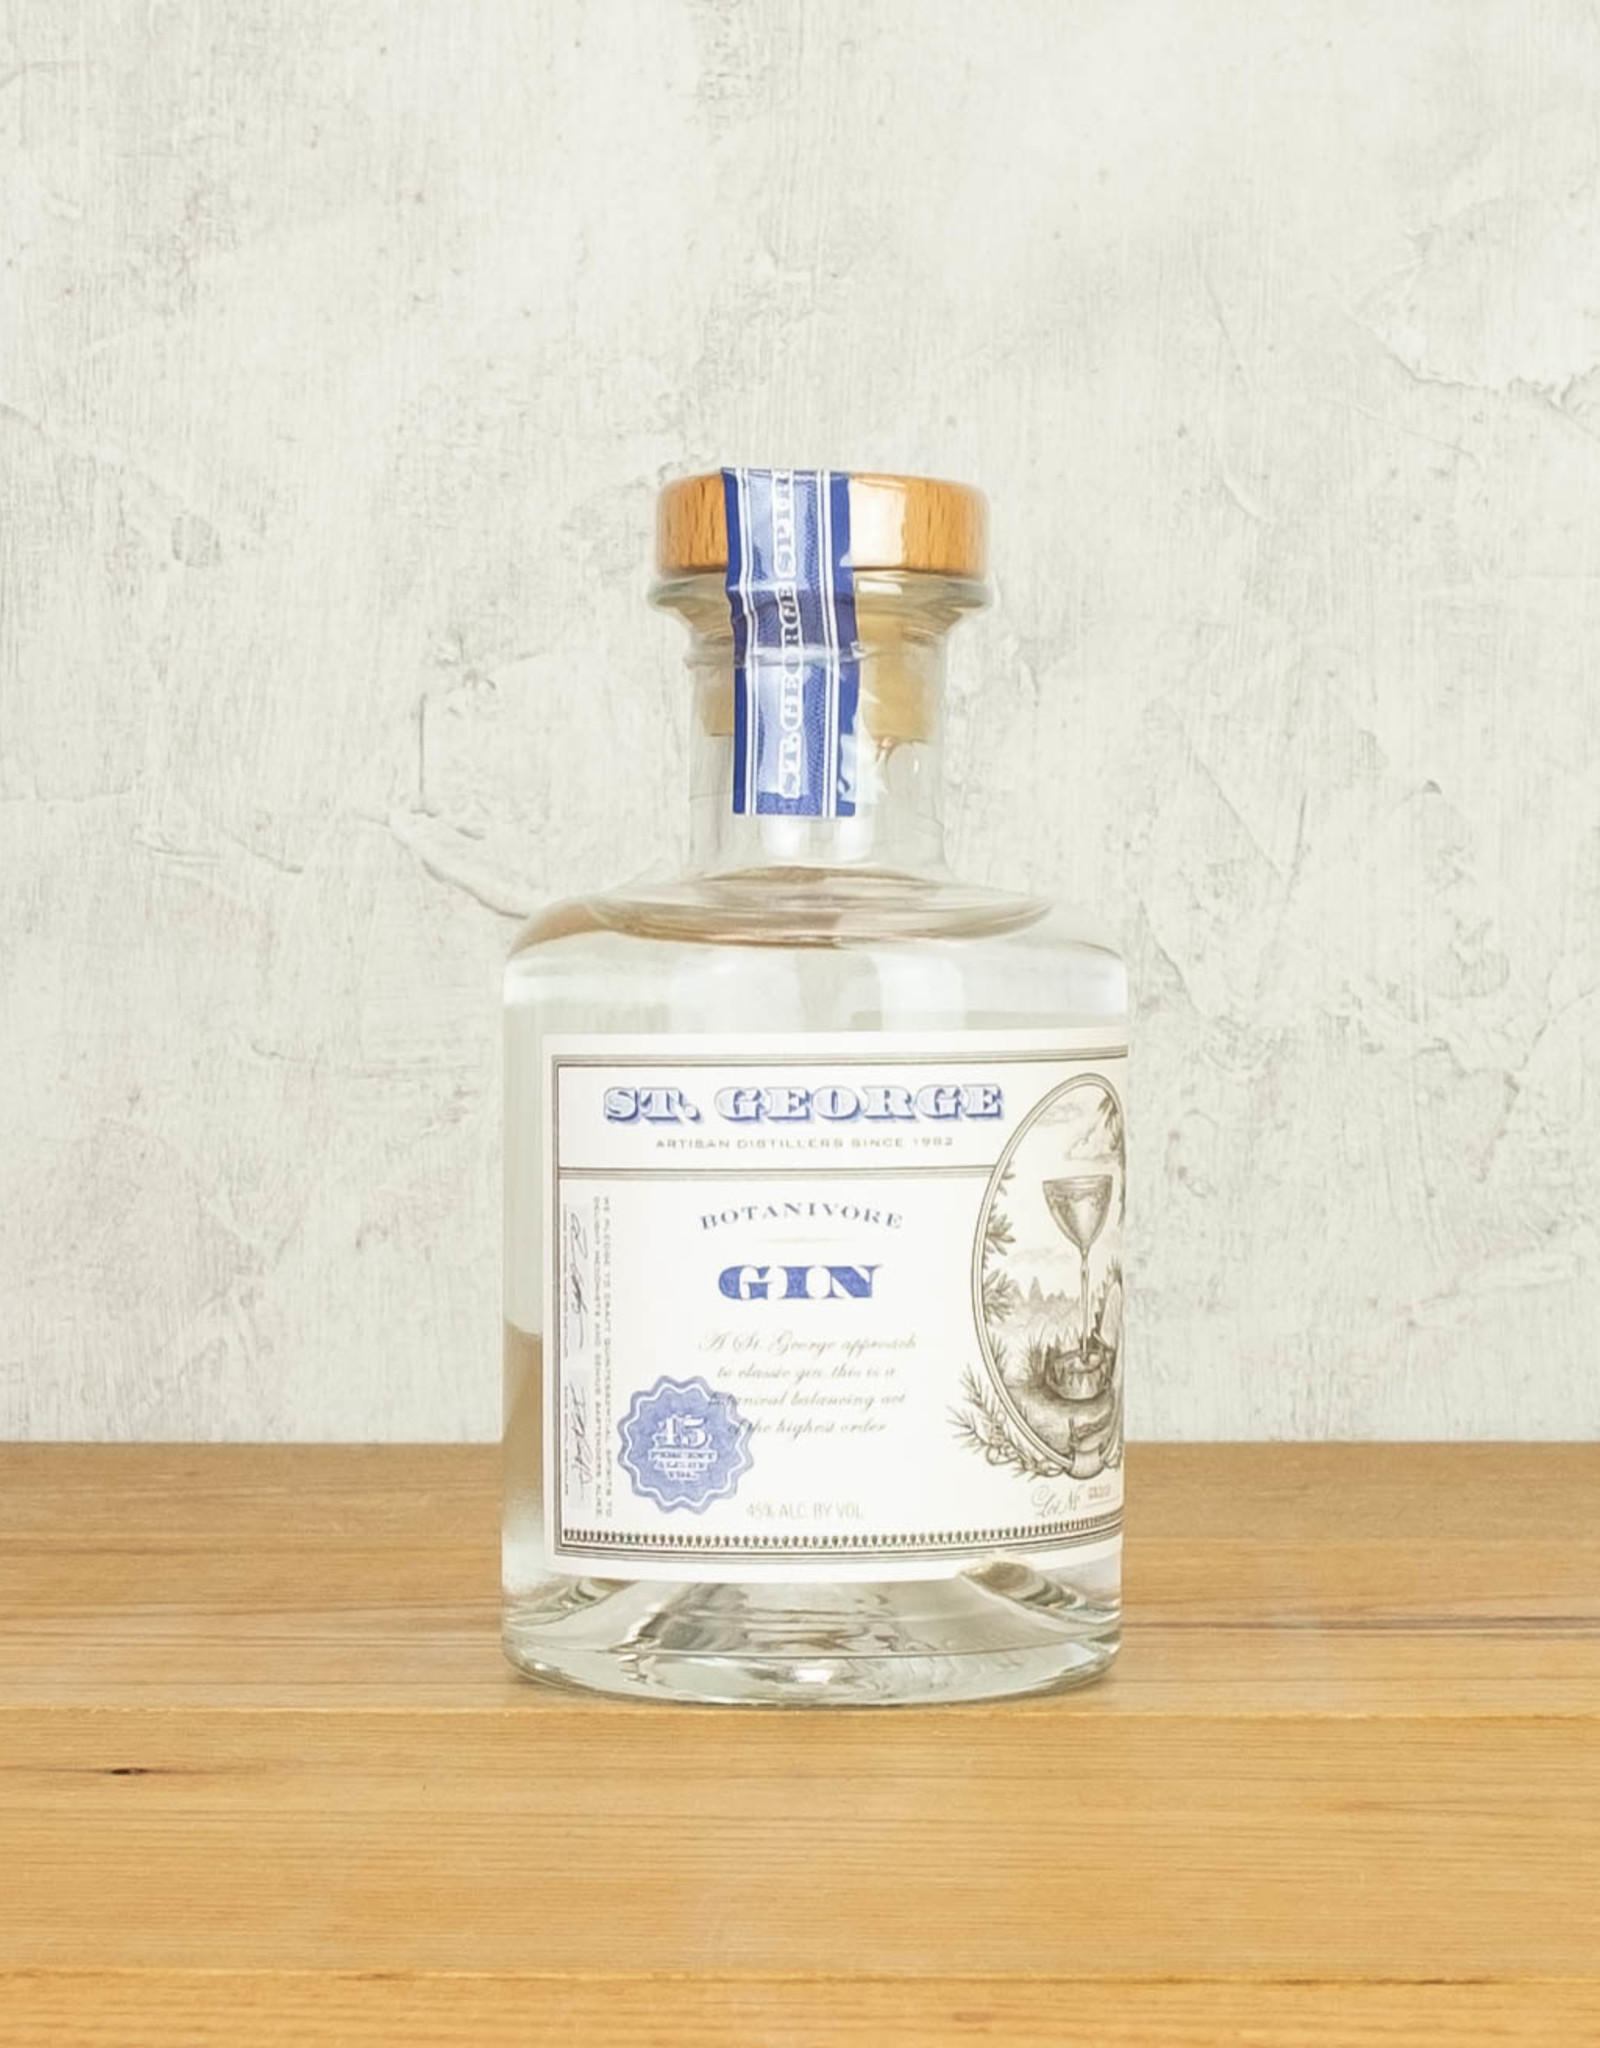 St George Botanivore Gin 200ml